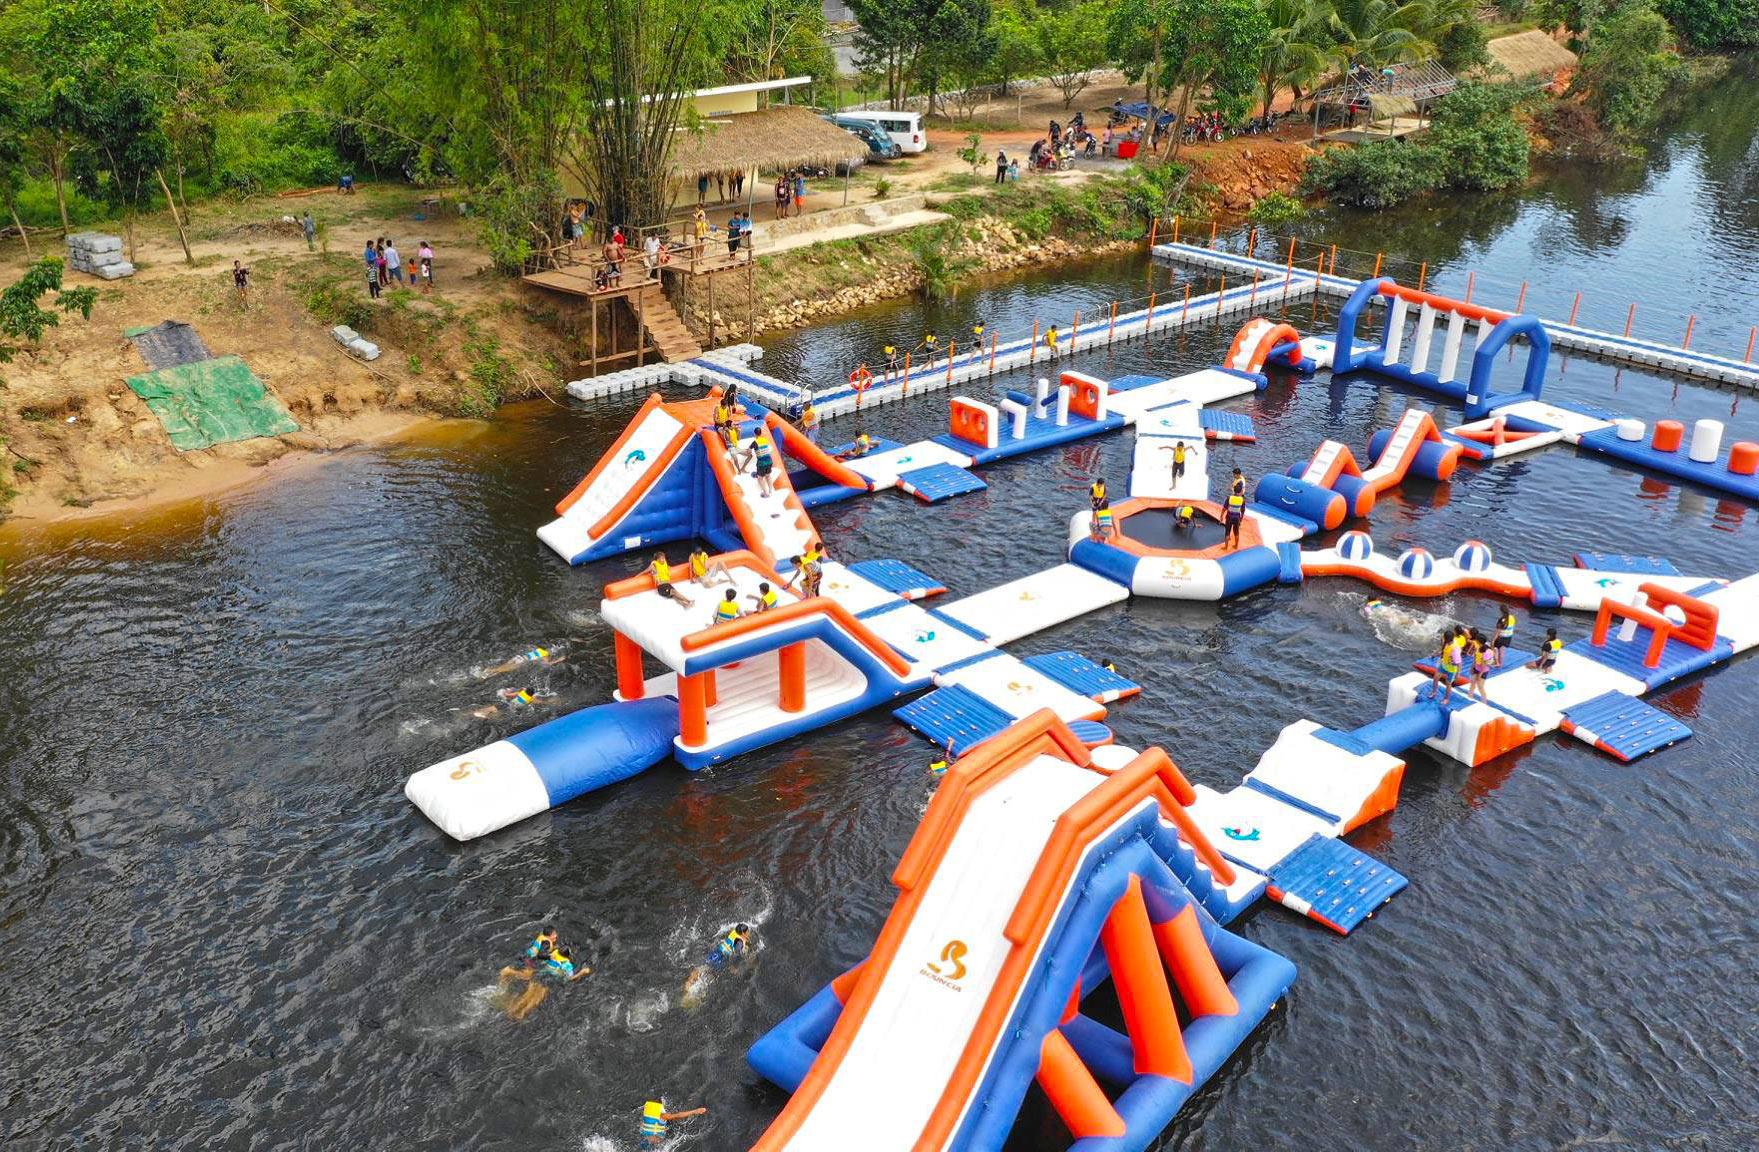 Dolphies Splash Waterpark